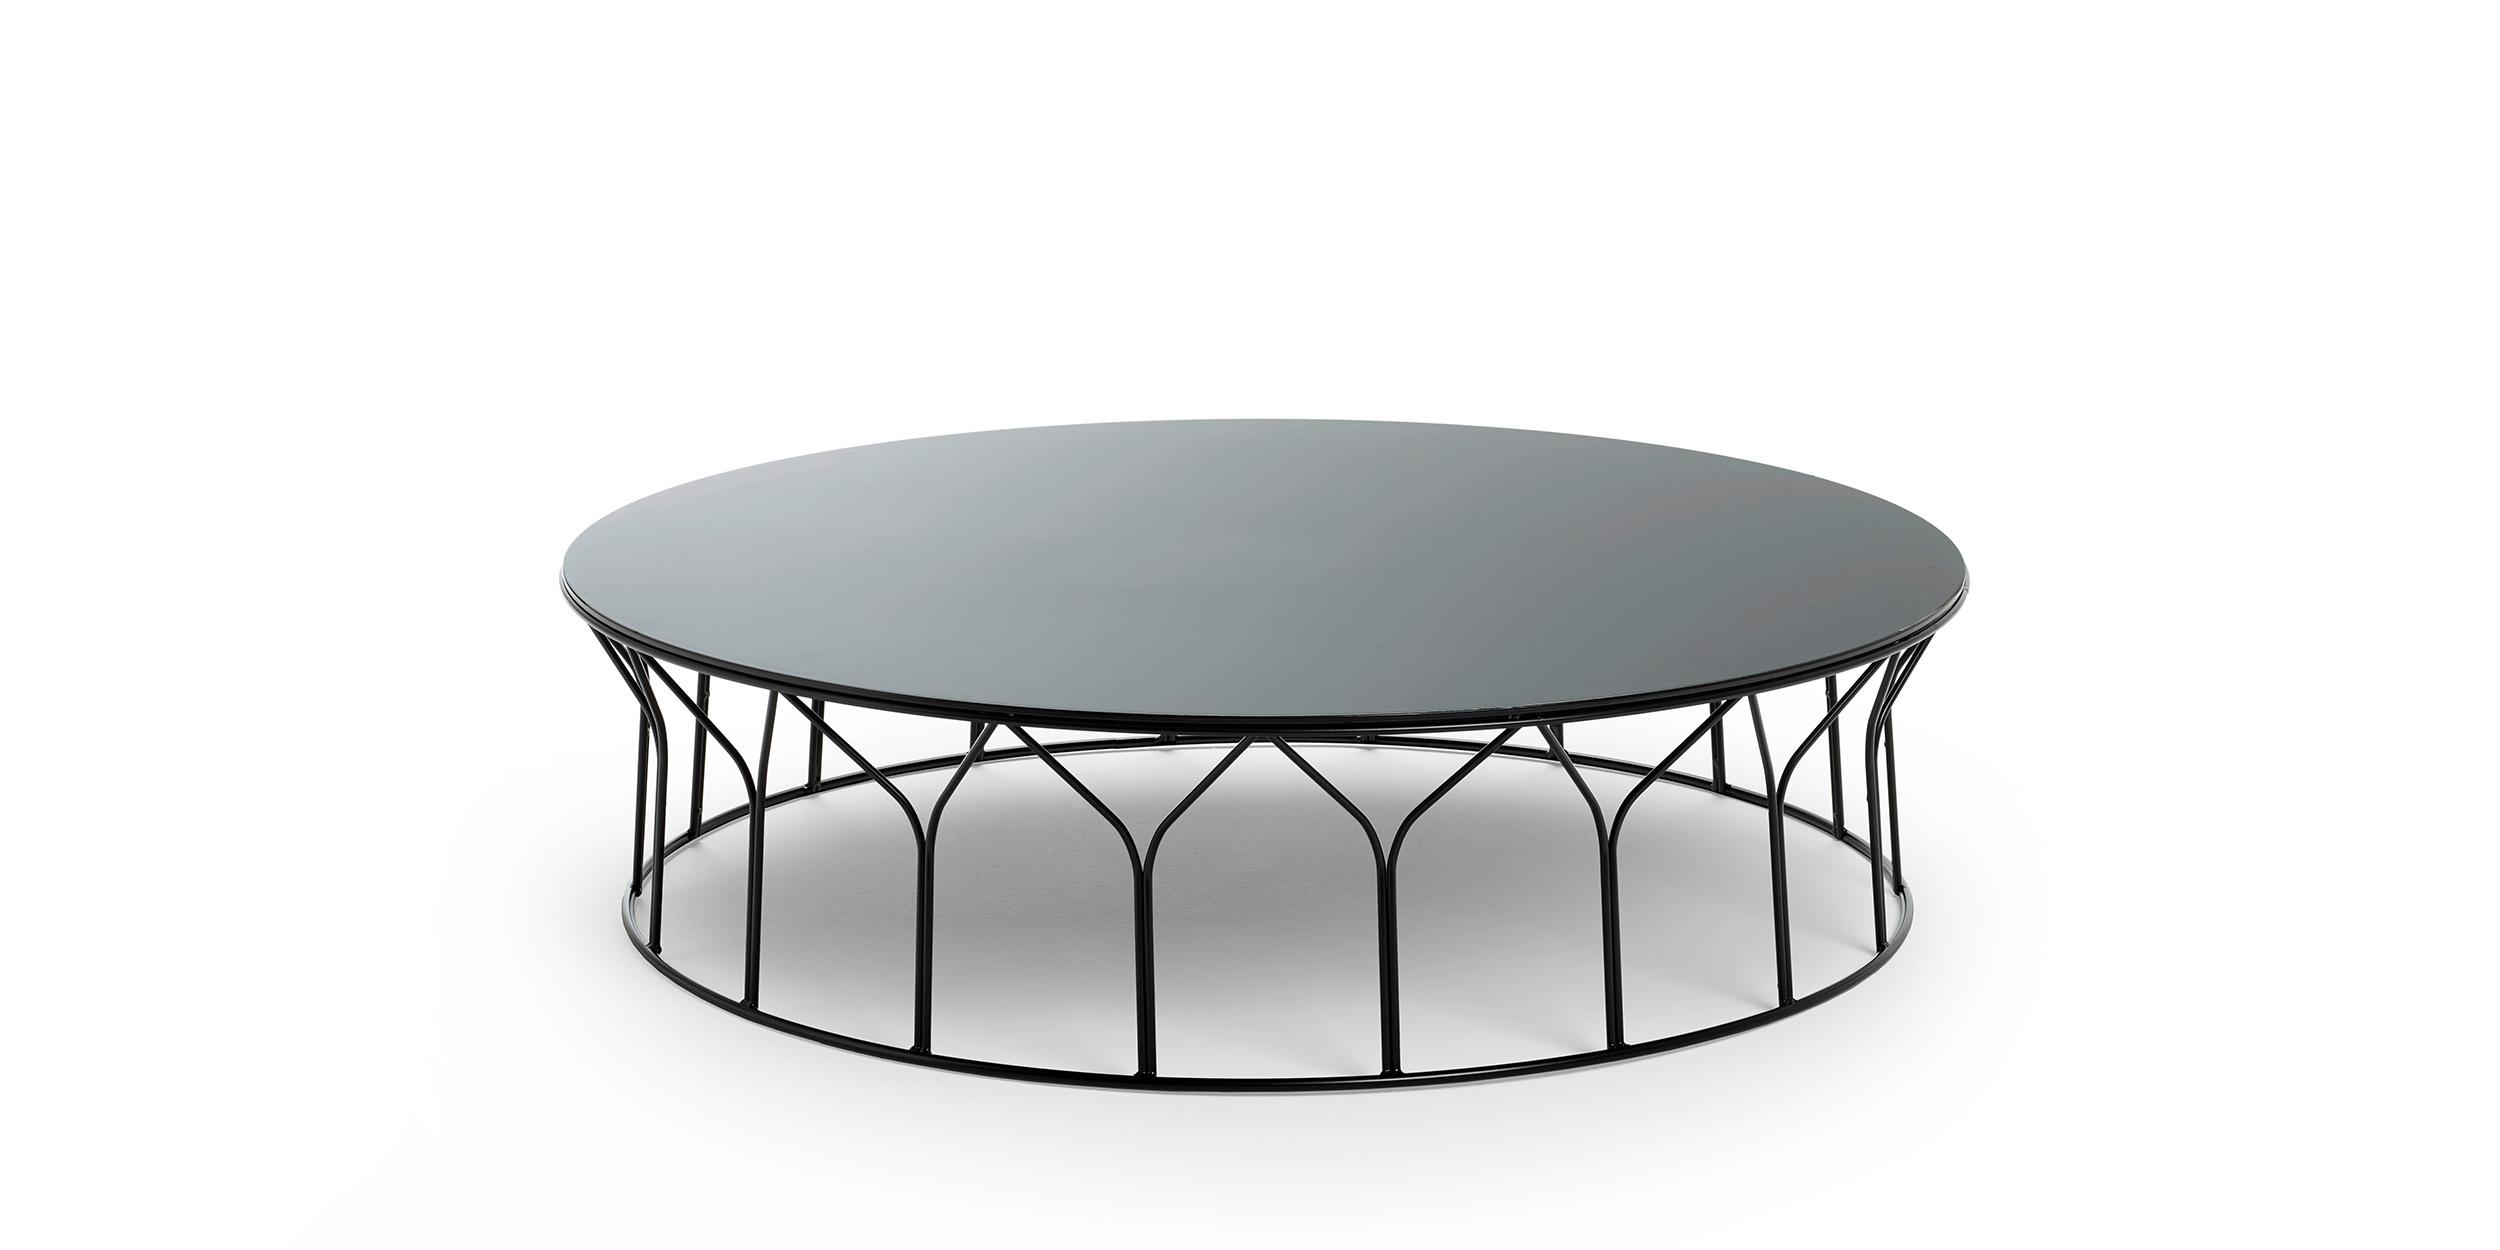 Prima Circus – Stort soffbord – Modern design av Formfjord – Offecct YU-39